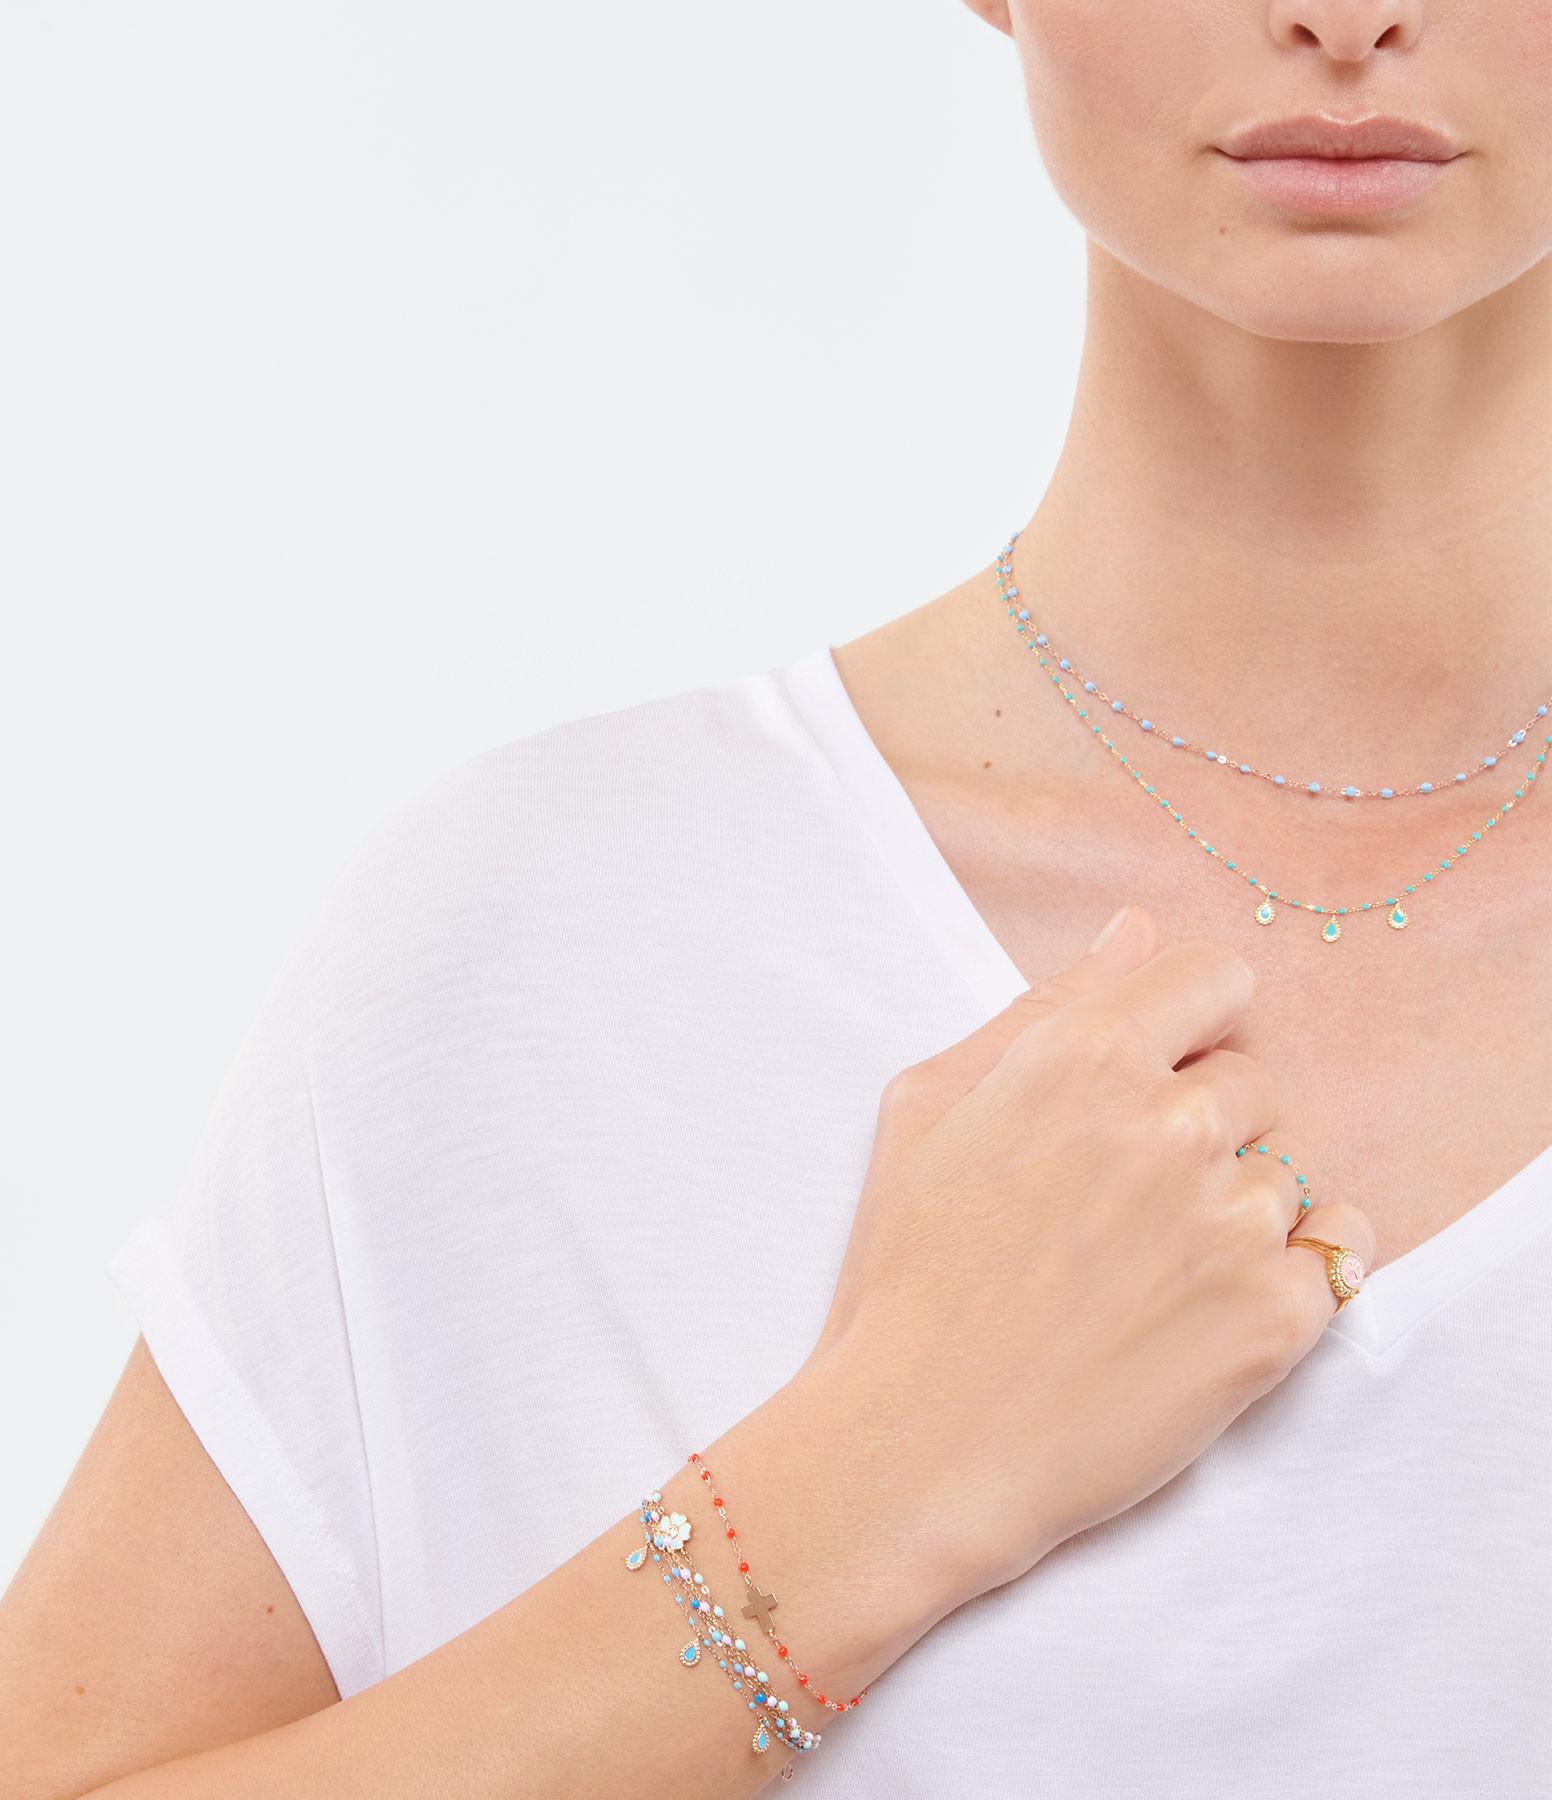 GIGI CLOZEAU - Bracelet Mini Perles Résine 3 Lucky Cachemire OJ